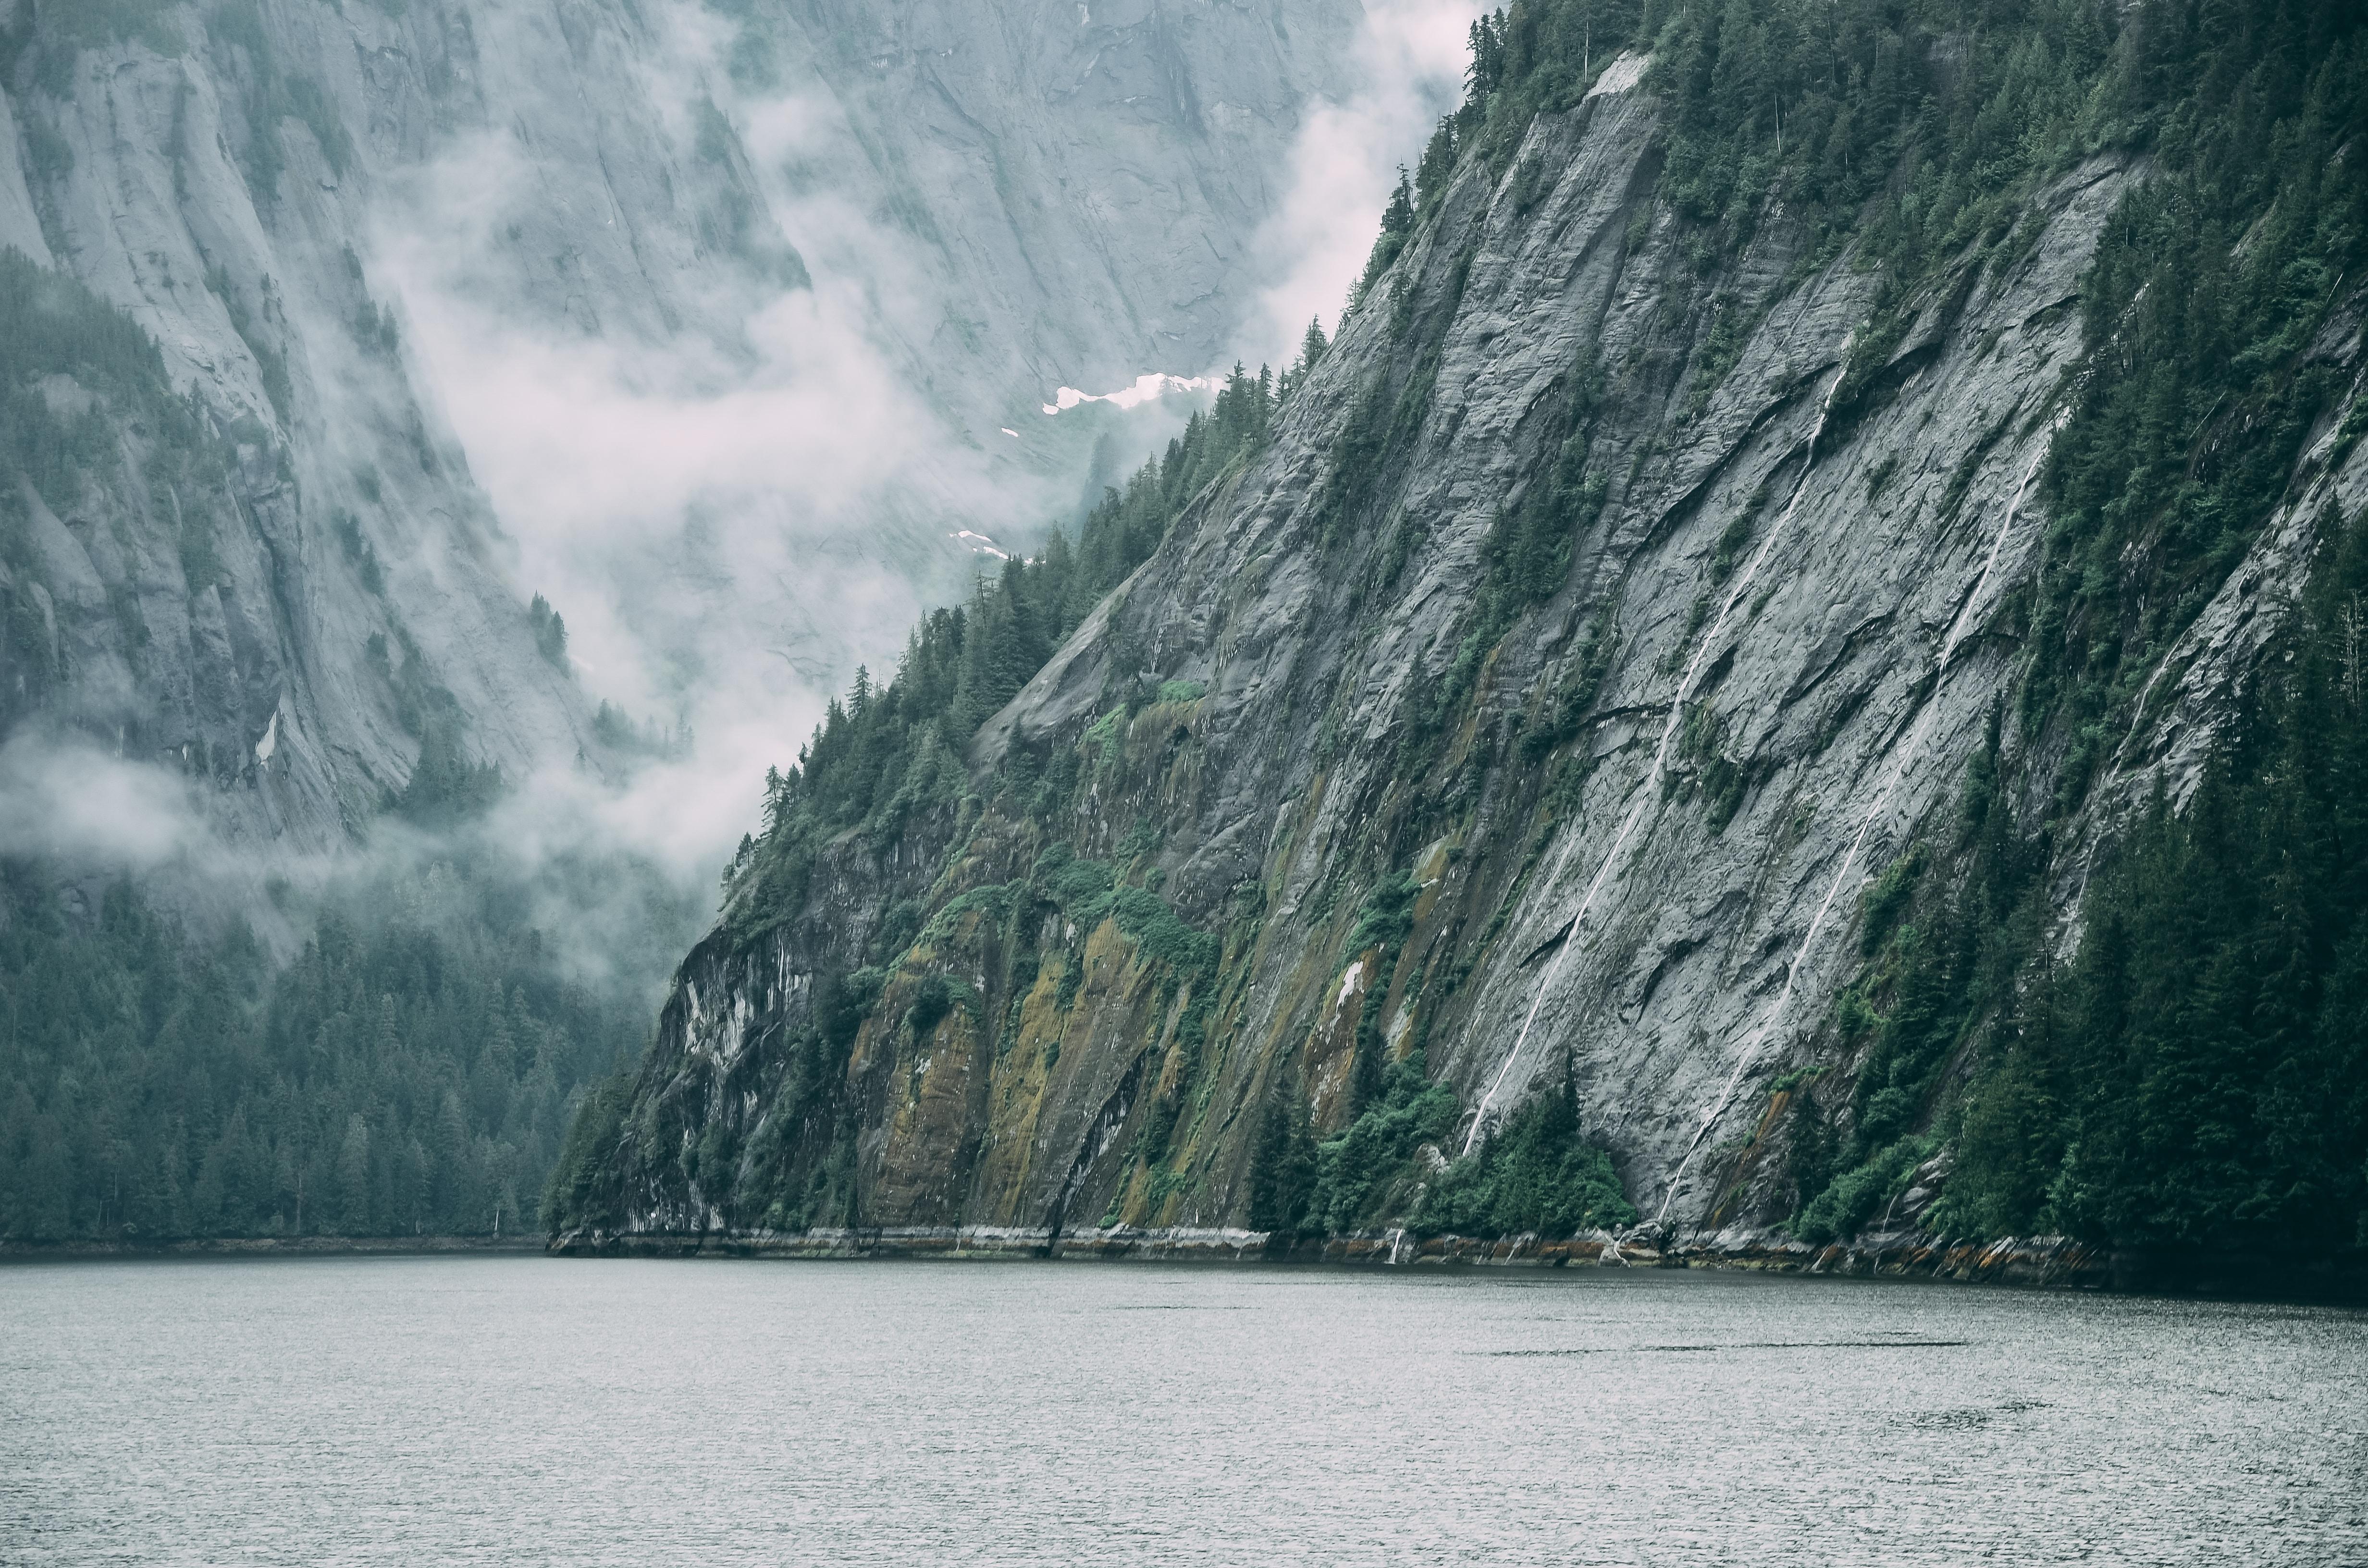 Rocky mountainsides line a serene lake on a foggy day in Alaska